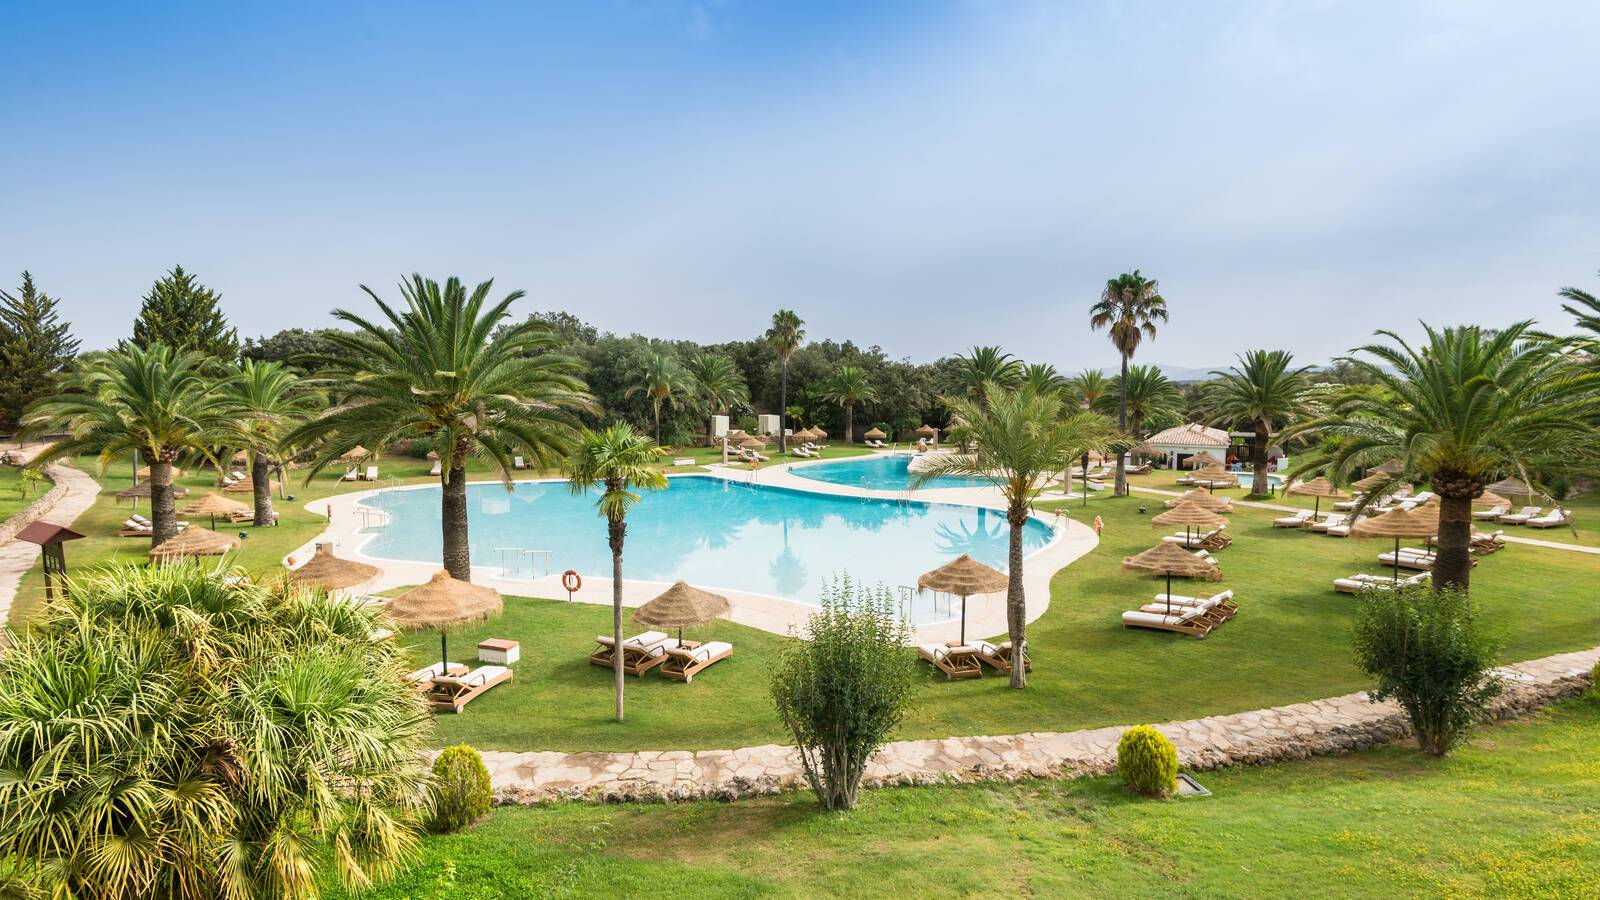 Barcelo la Bobadilla Andalousie piscine exterieure